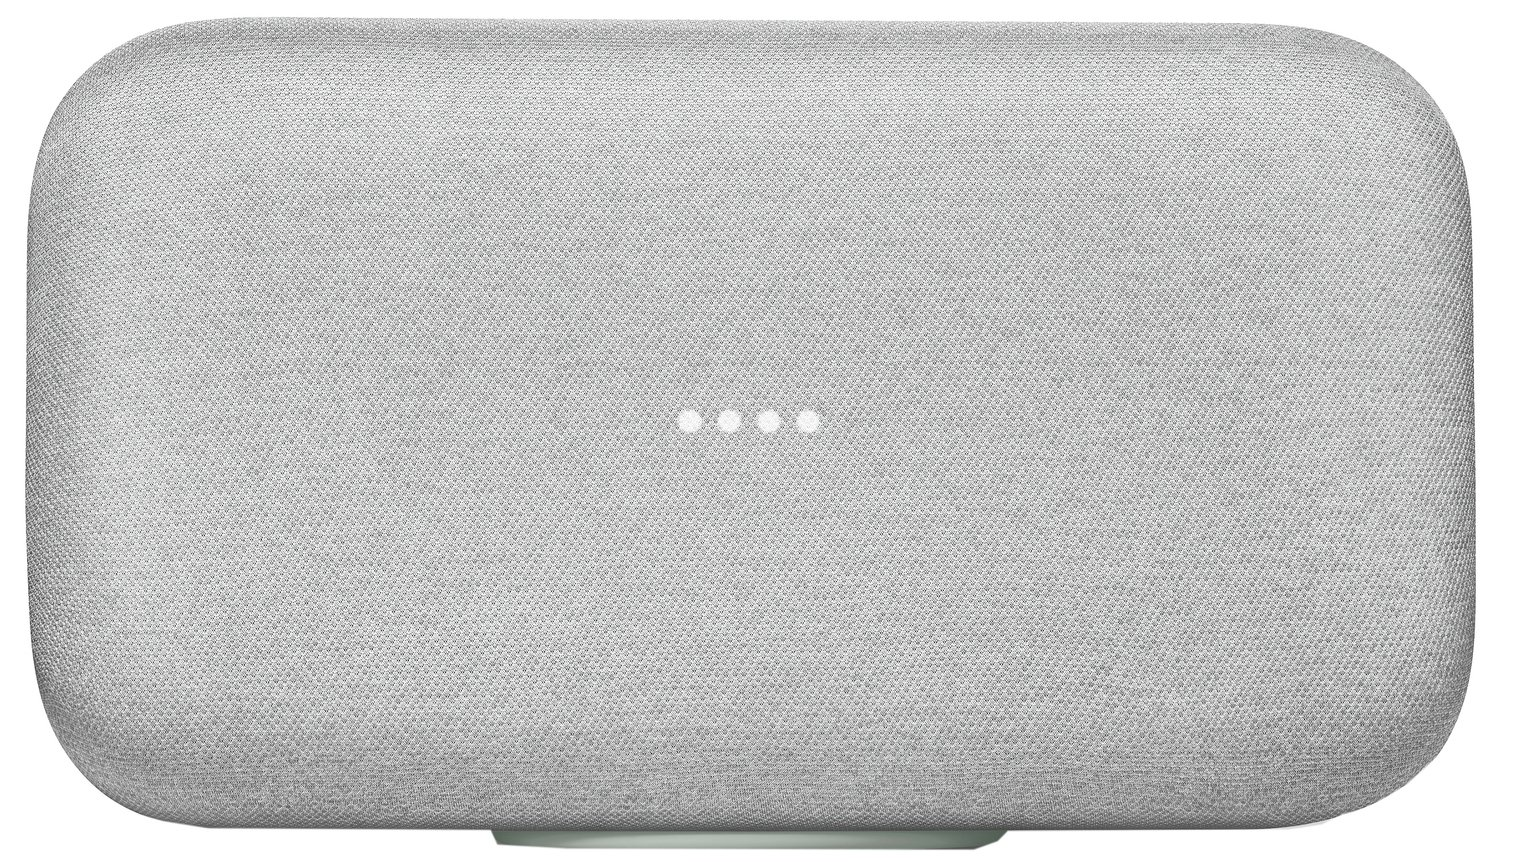 Google Home Max - Chalk